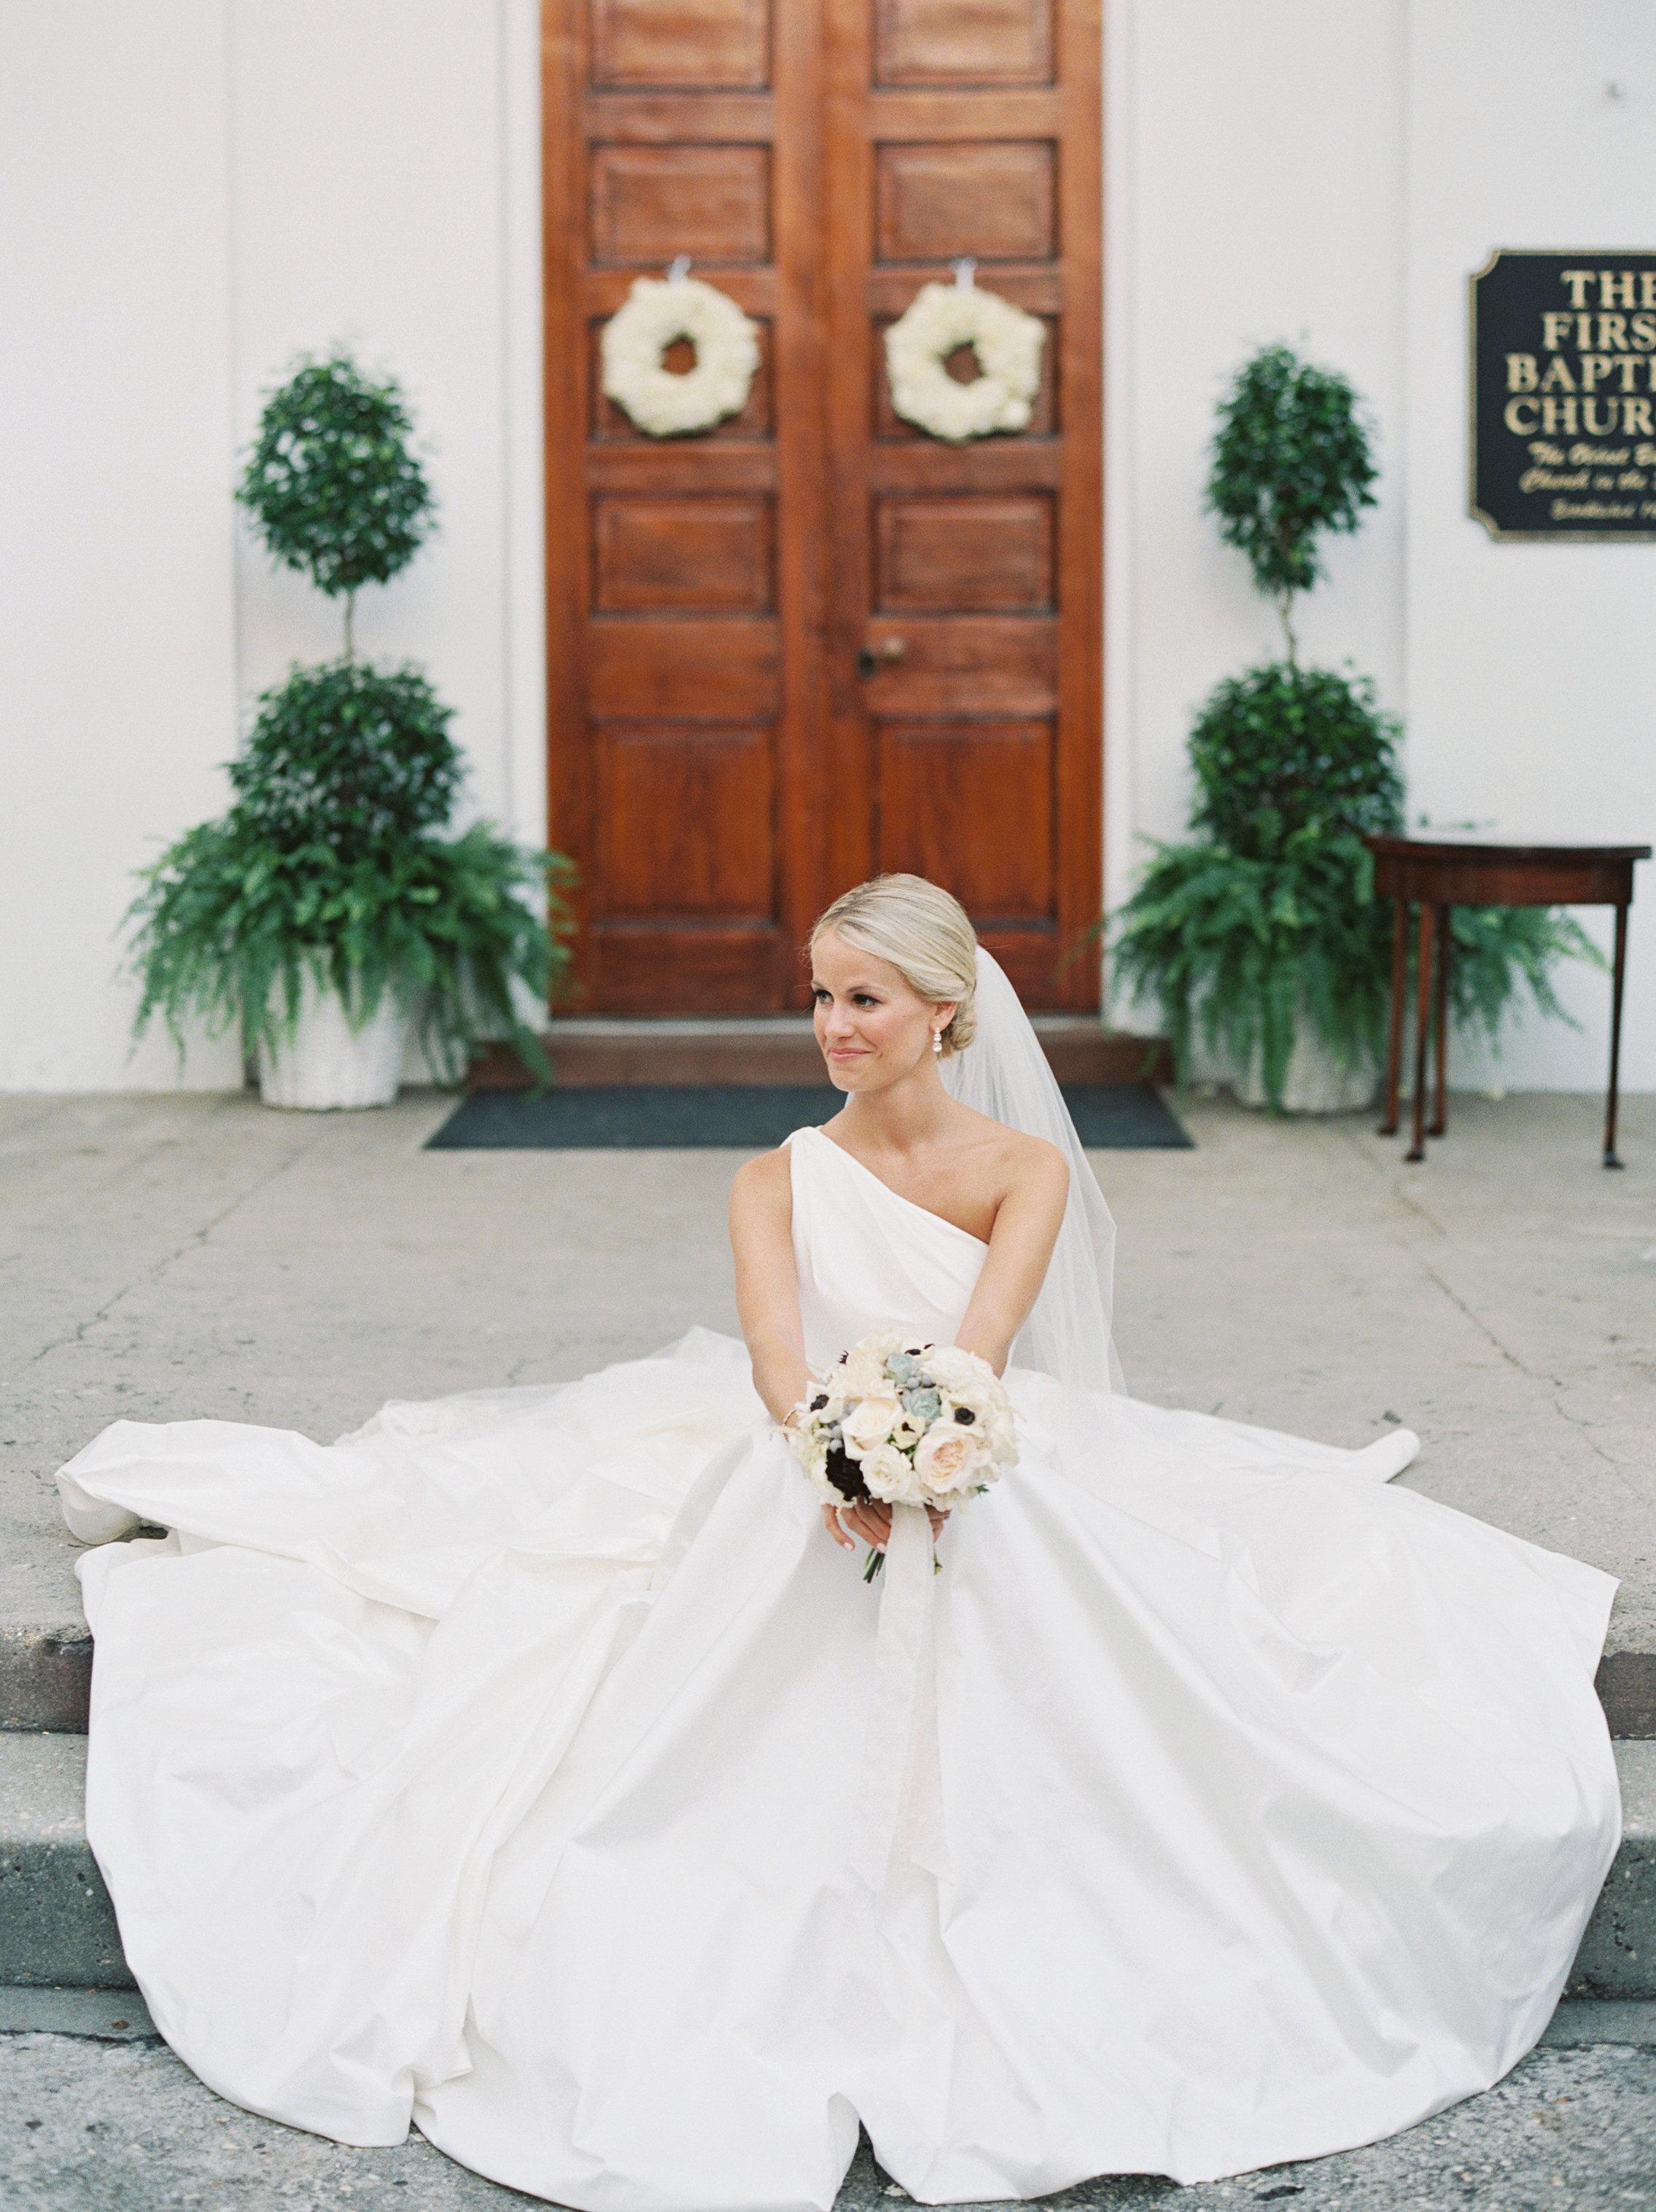 Charleston bride in Romona Keveza wedding gown from Maddison Row  //  Wedding photography by Landon Jacob  //  A Lowcountry Wedding Magazine